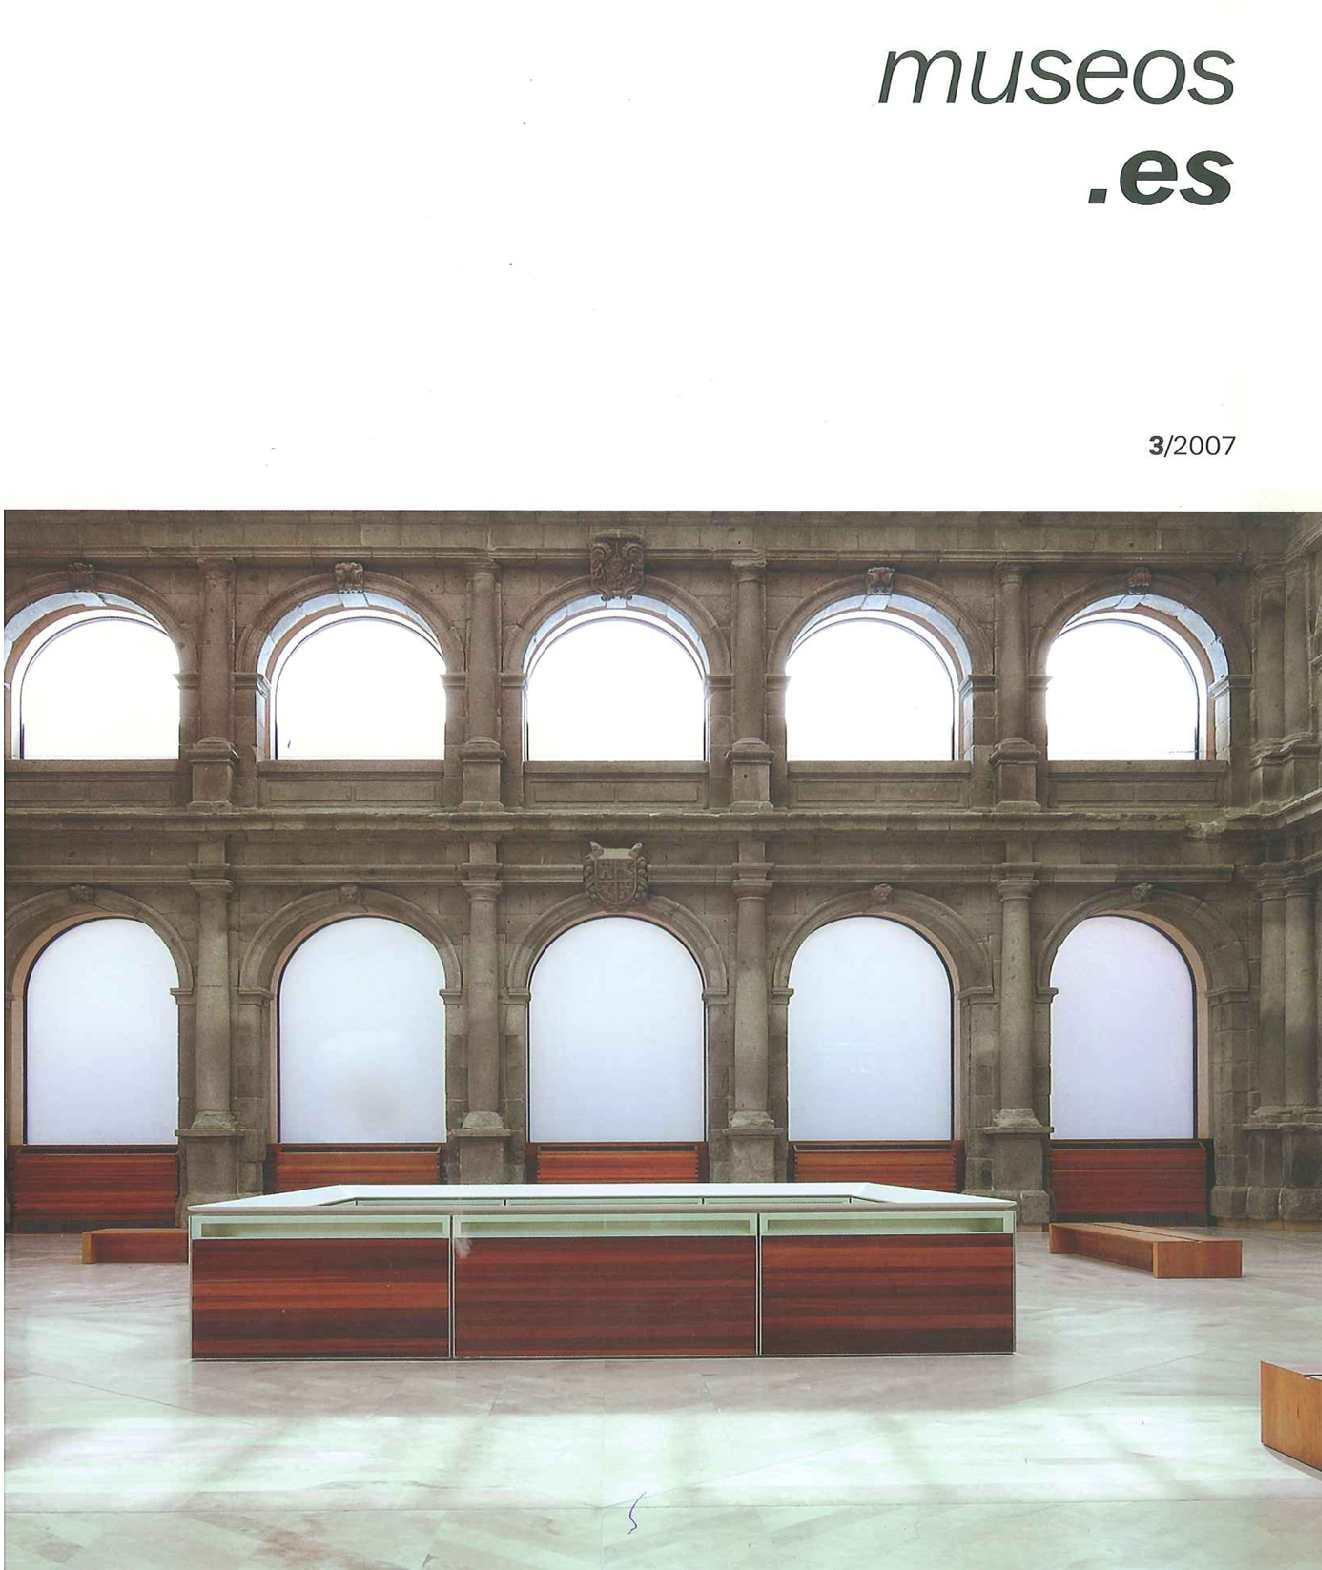 Calaméo - Museos.es nº 3